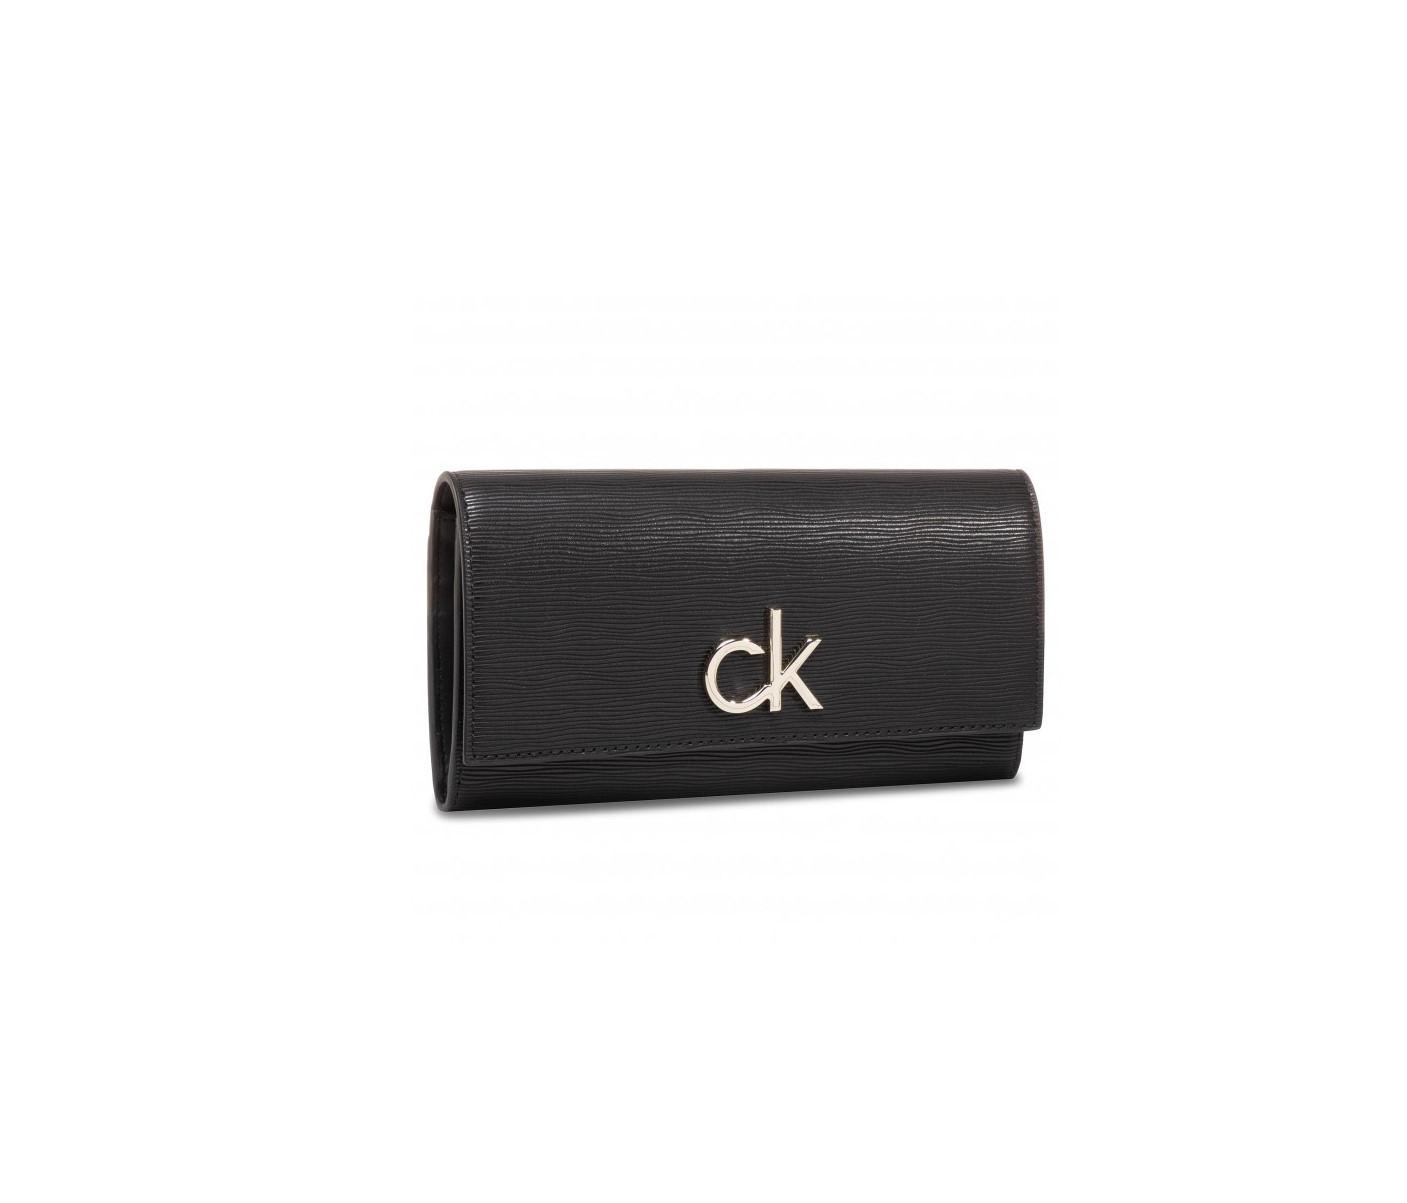 Calvin Klein Calvin Klein dámská černá peněženka s klopou